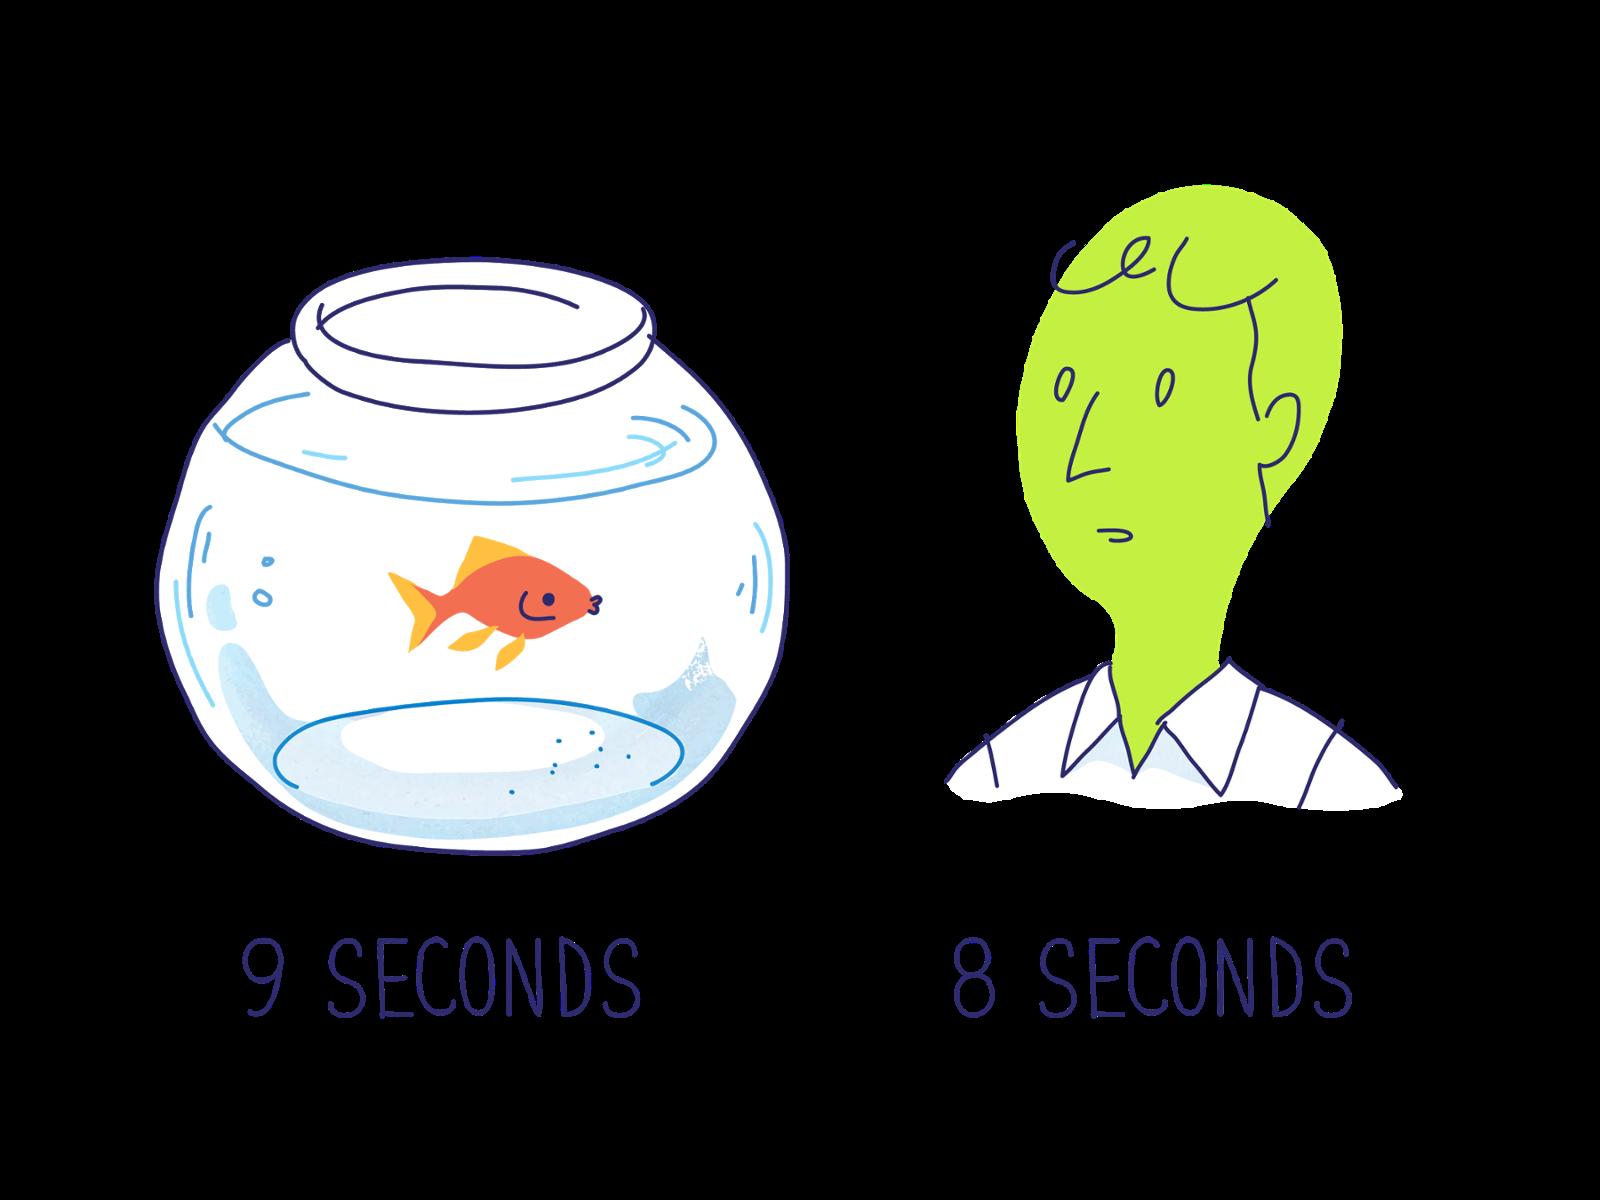 Goldfish clipart attention span. Fun fact millennials have